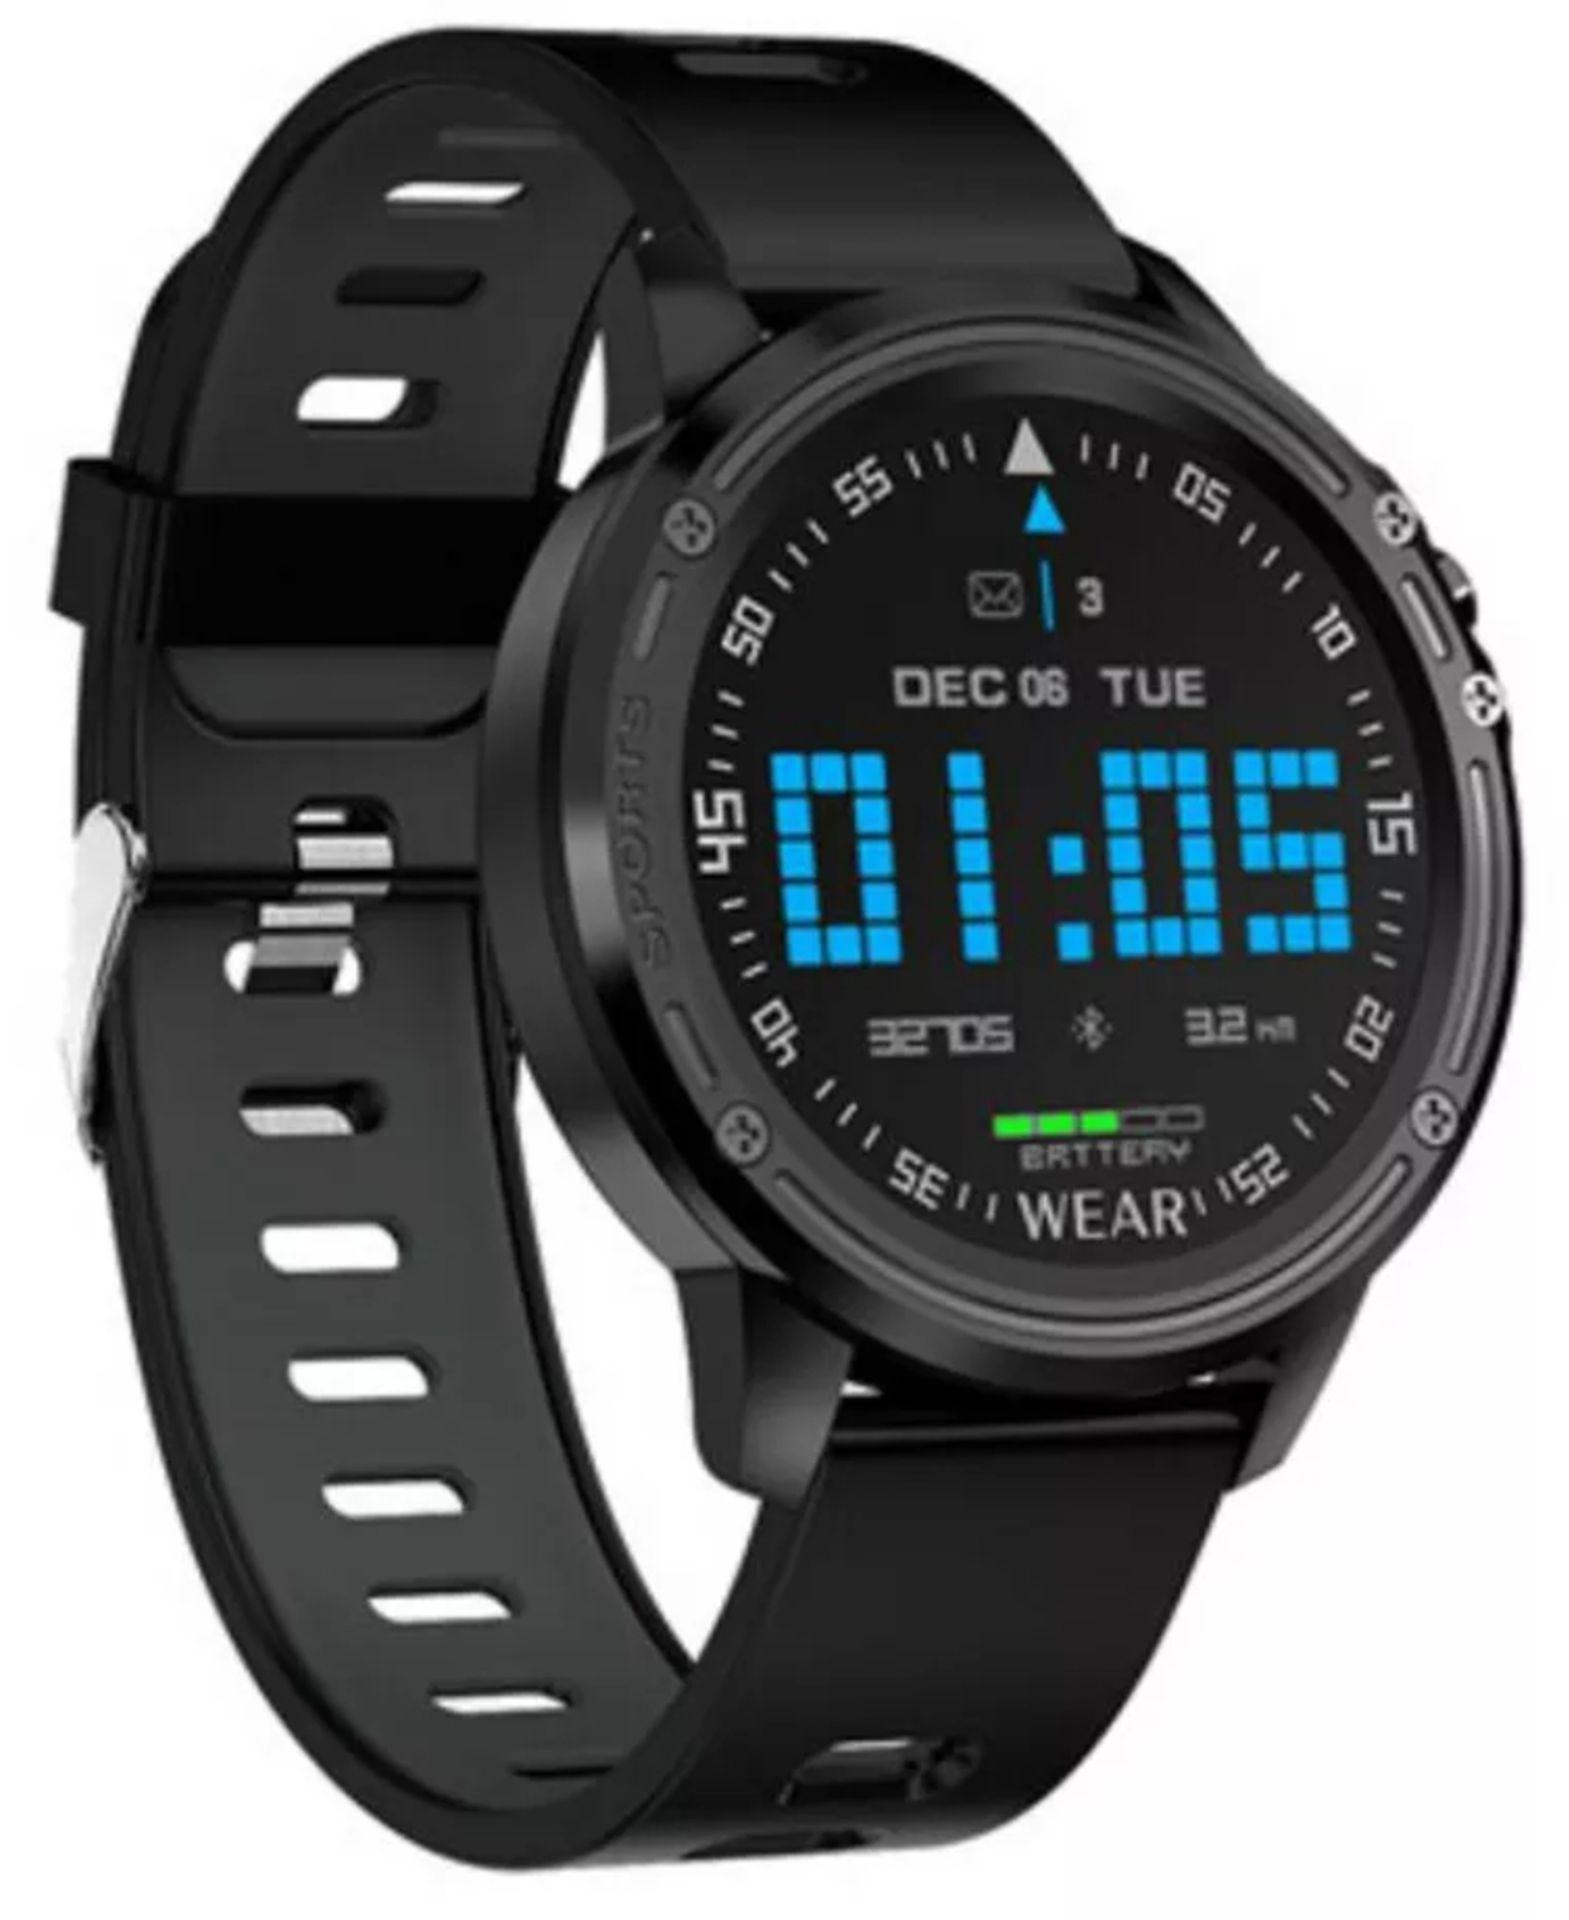 Lot 162 - L8 Smart Watch Blood Pressure Heart Rate Smart Bracelet Fitness Tracker, Red/ Black Strap